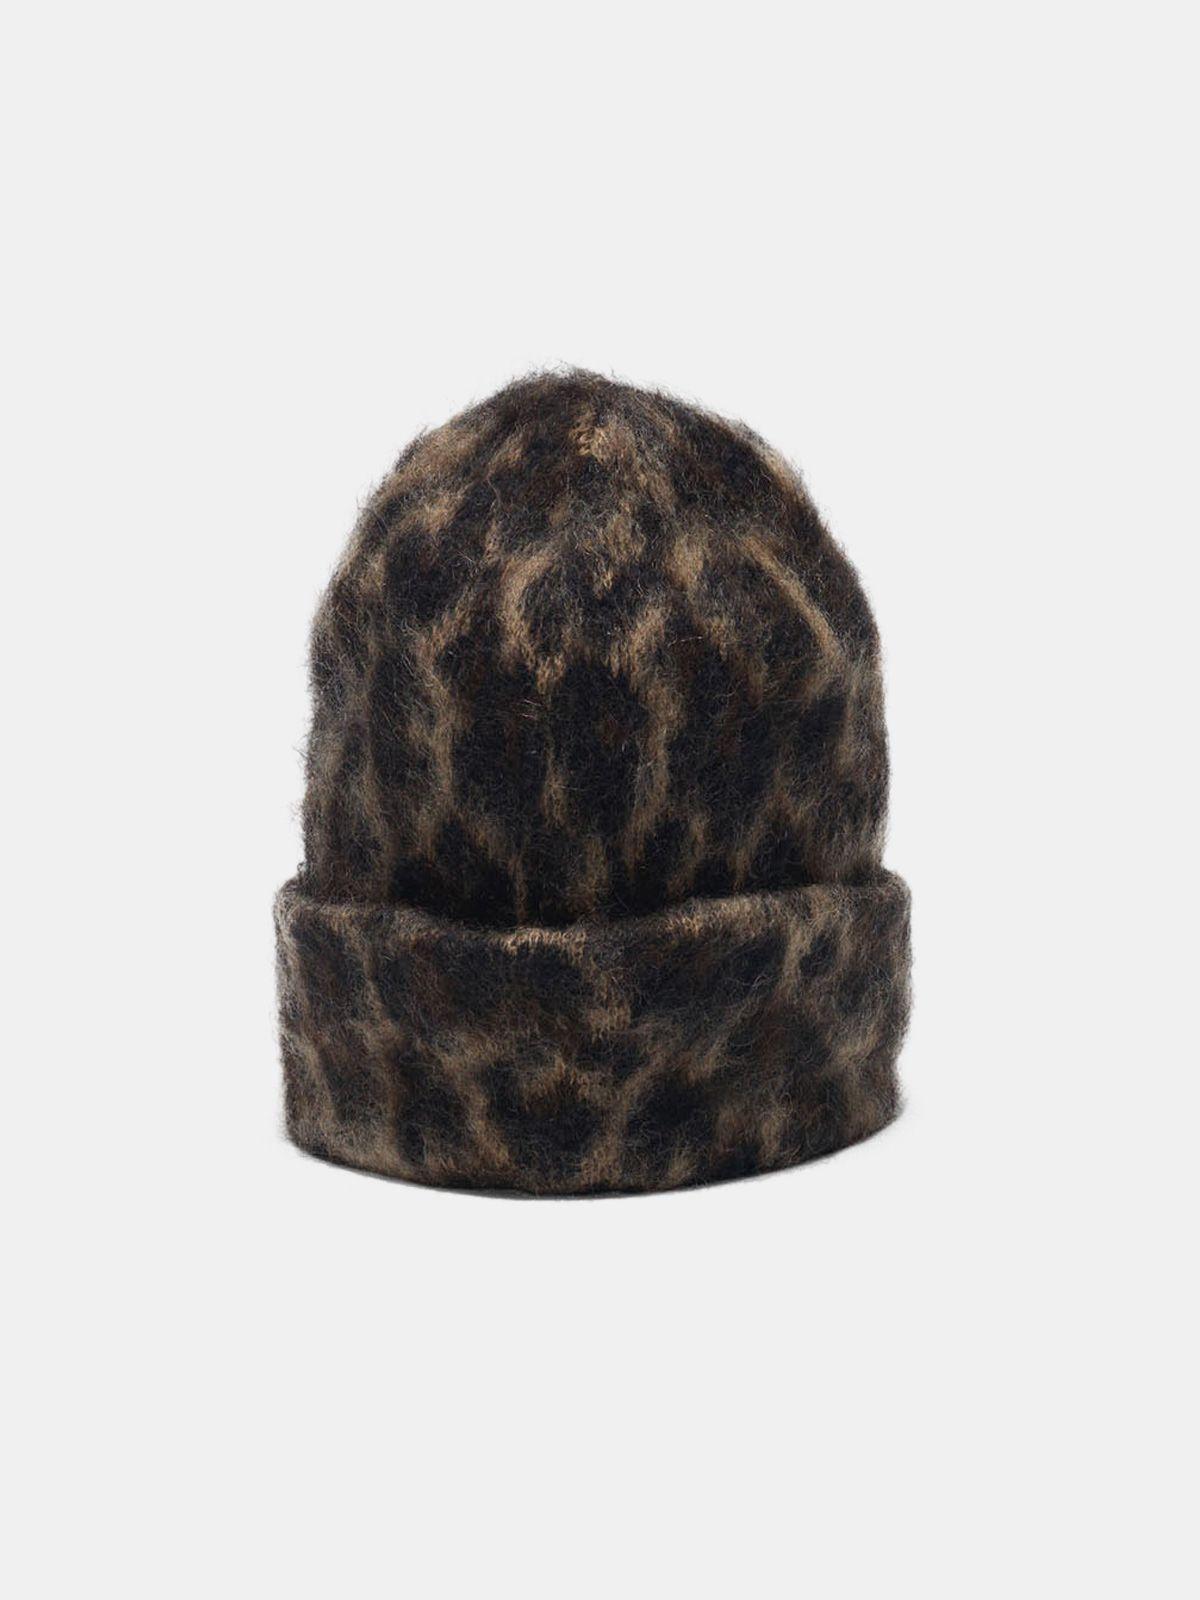 Golden Goose - Kiku jaguar jacquard beanie made of brushed mohair wool in